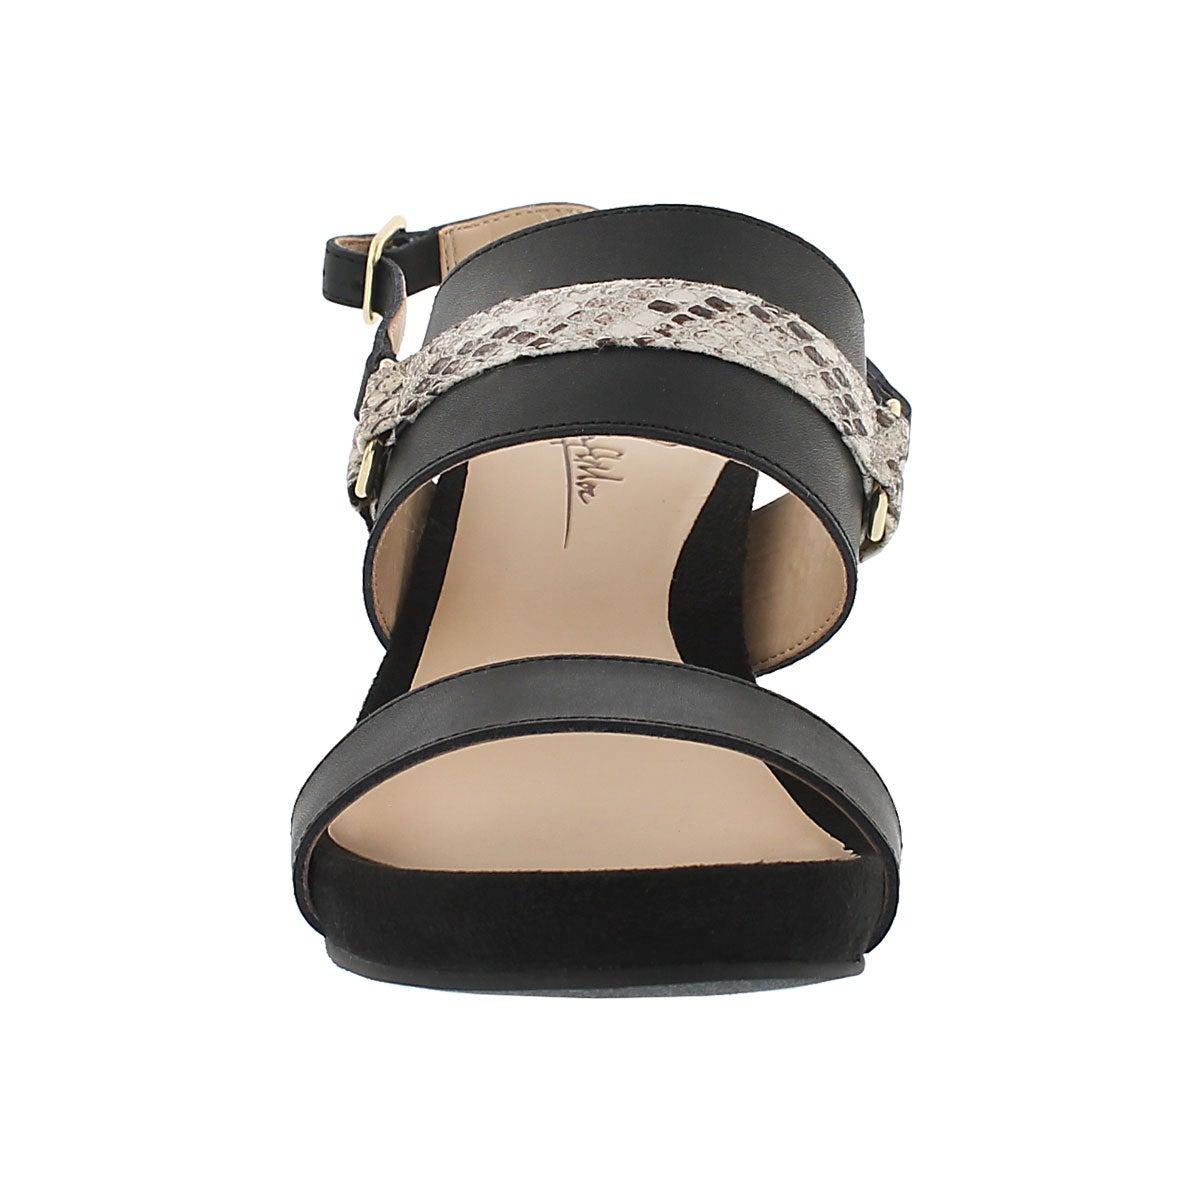 Lds Gili blk mem. foam wedge sandal